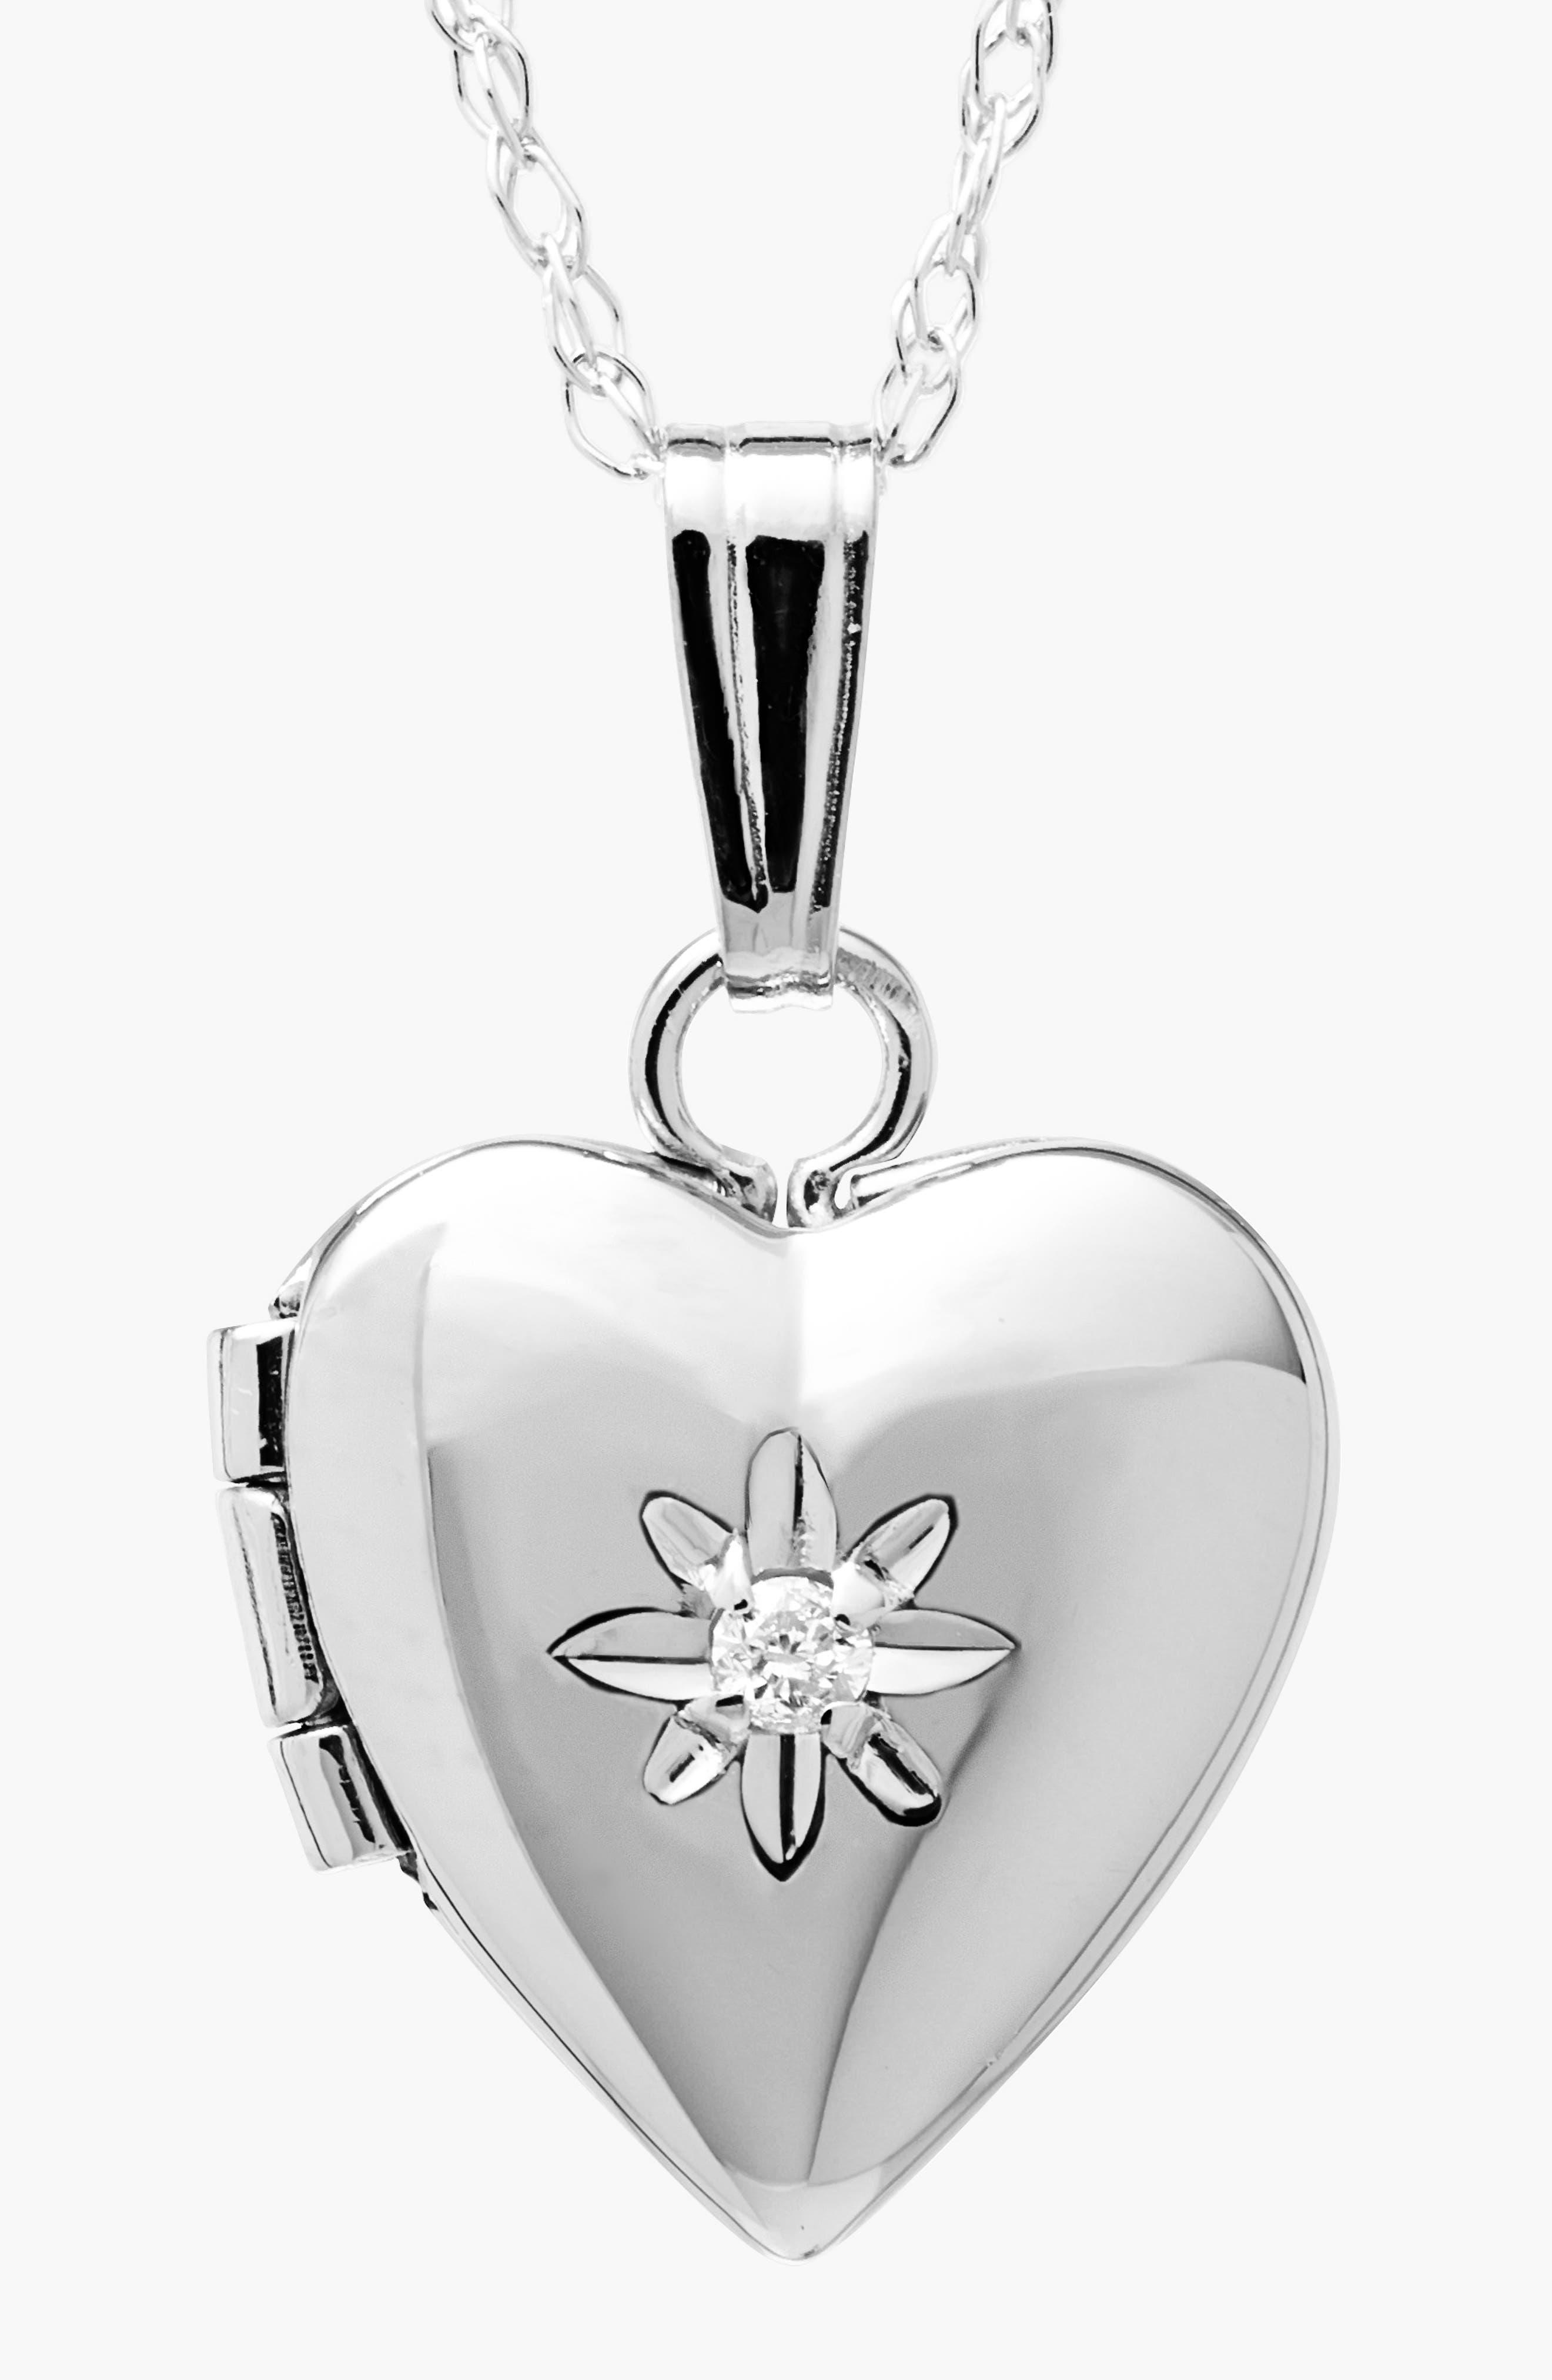 14k White Gold Heart Locket Necklace,                             Alternate thumbnail 2, color,